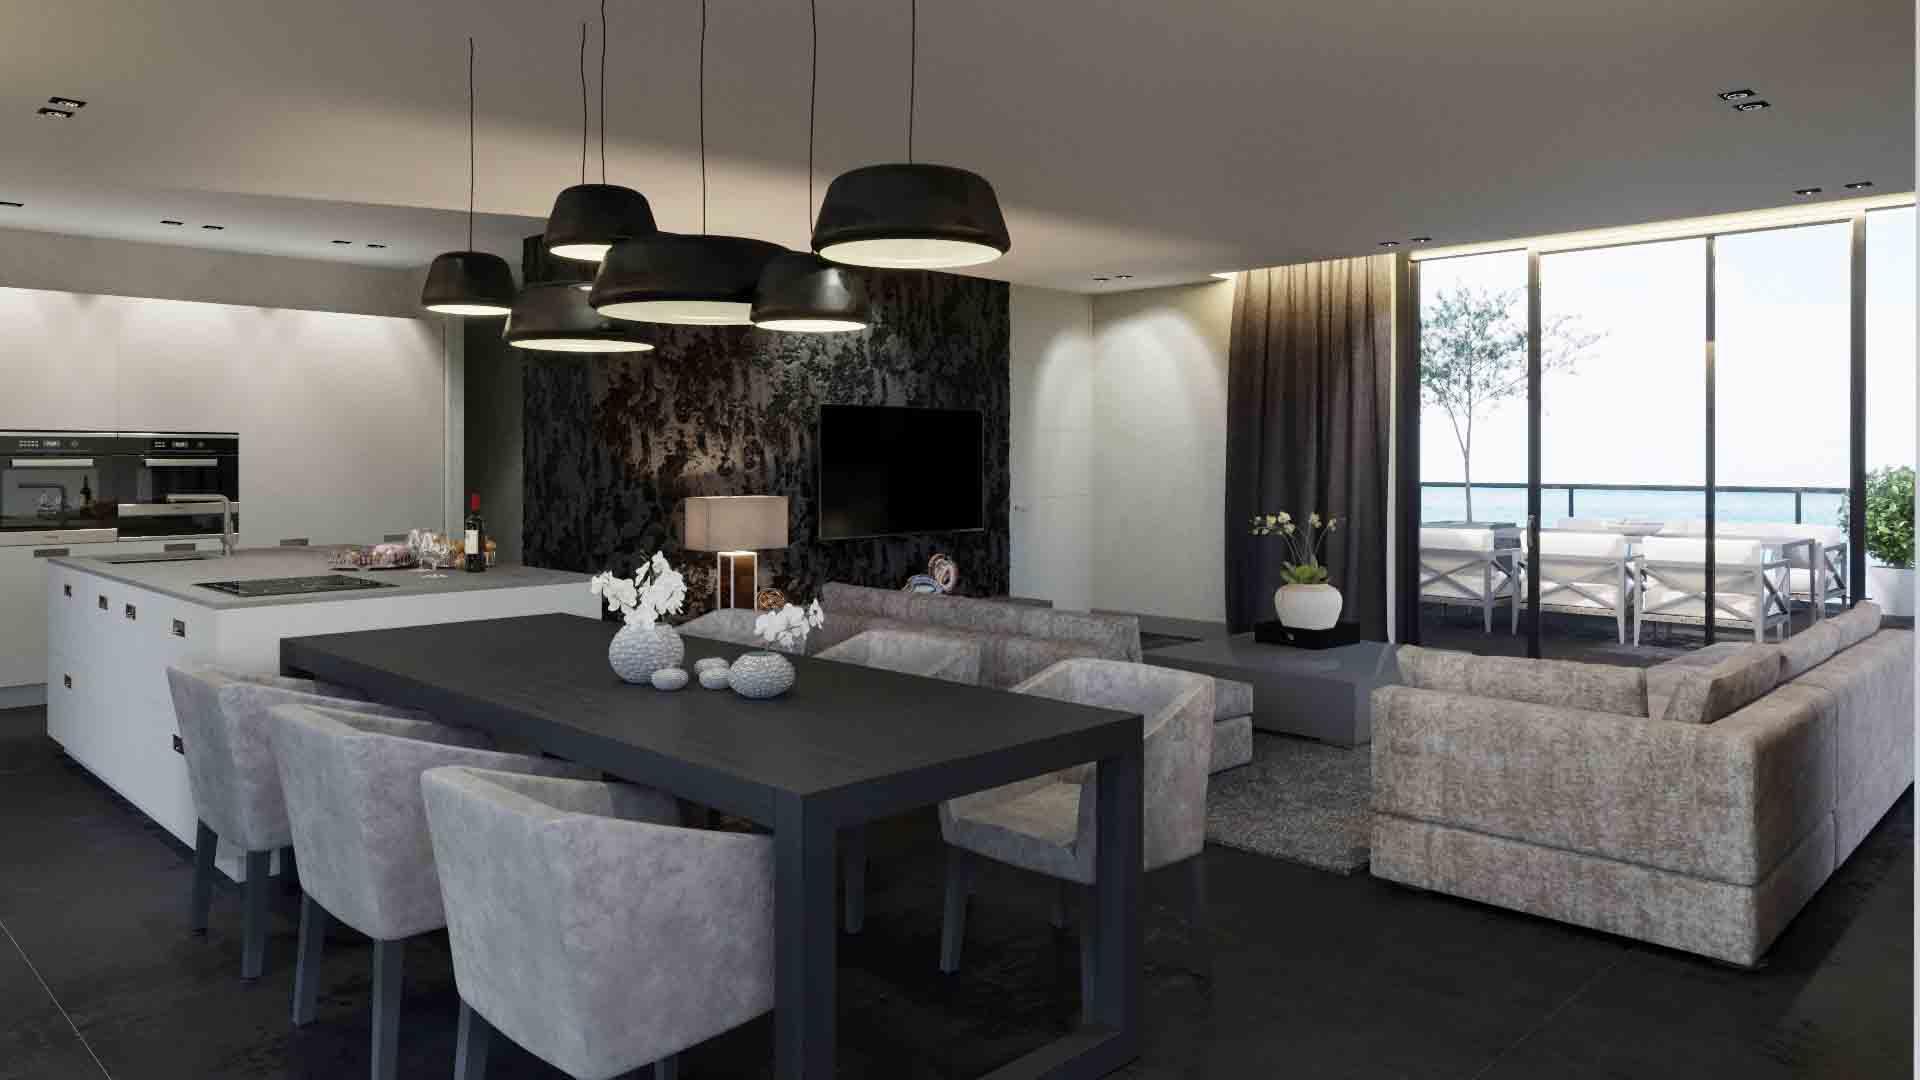 Penthouse-almere-duin-poort-nieuwbouw-duin-interior.01